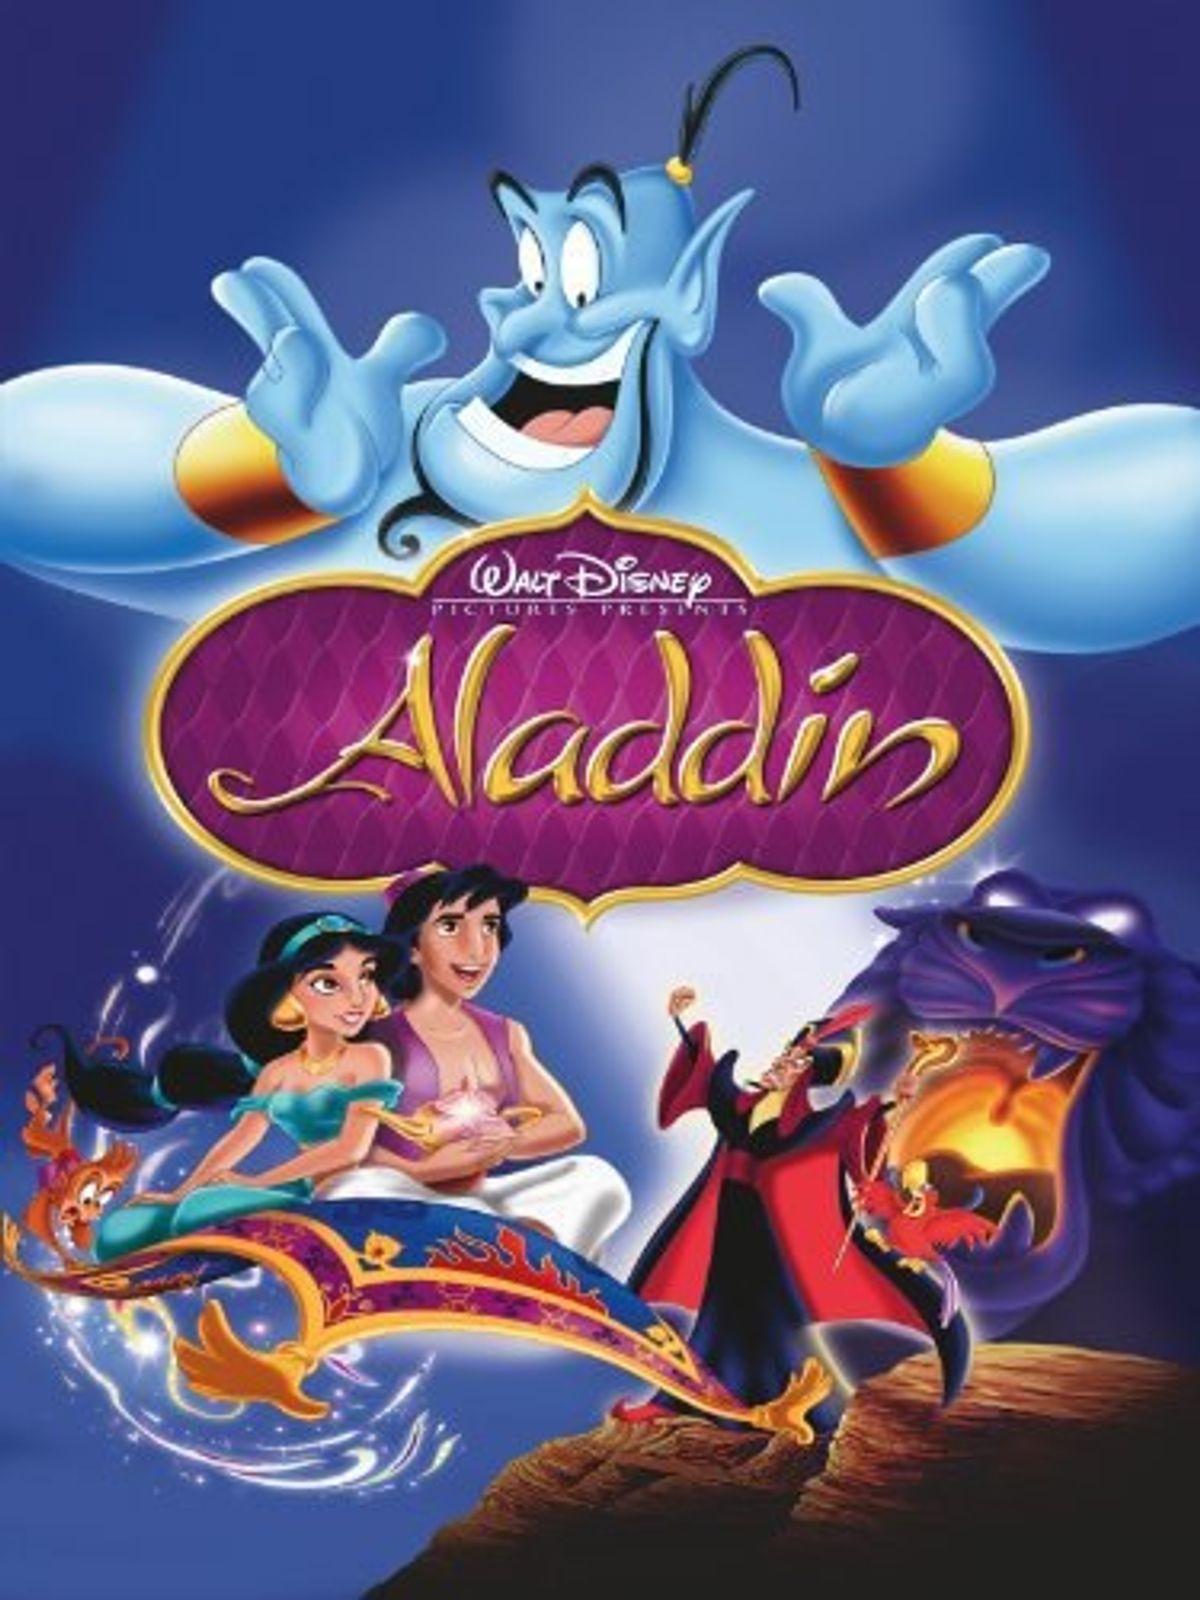 17 Reasons We All Need A Friend Like 'Aladdin's Genie